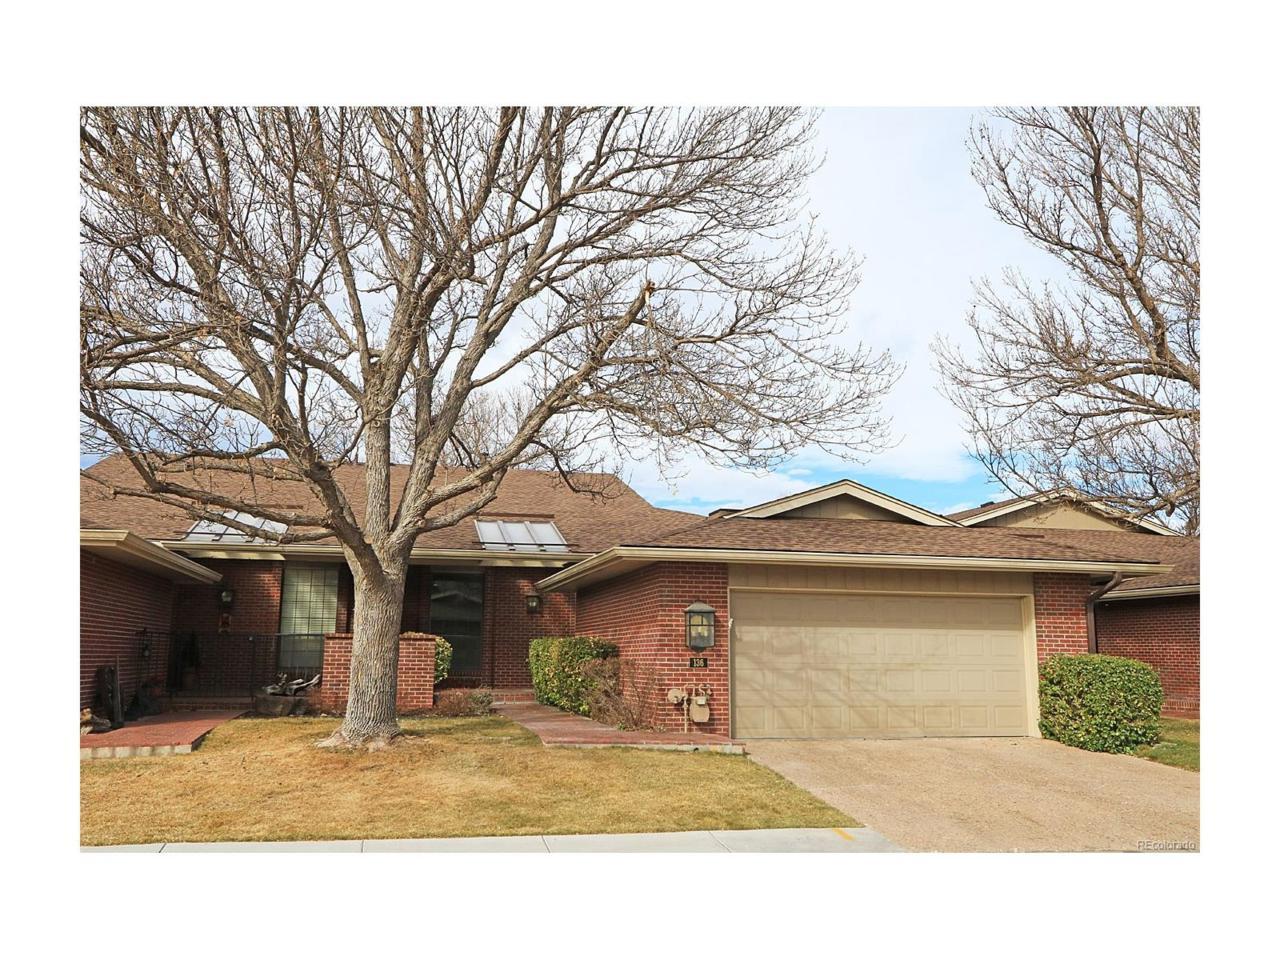 2800 S University Boulevard #136, Denver, CO 80210 (MLS #3361340) :: 8z Real Estate